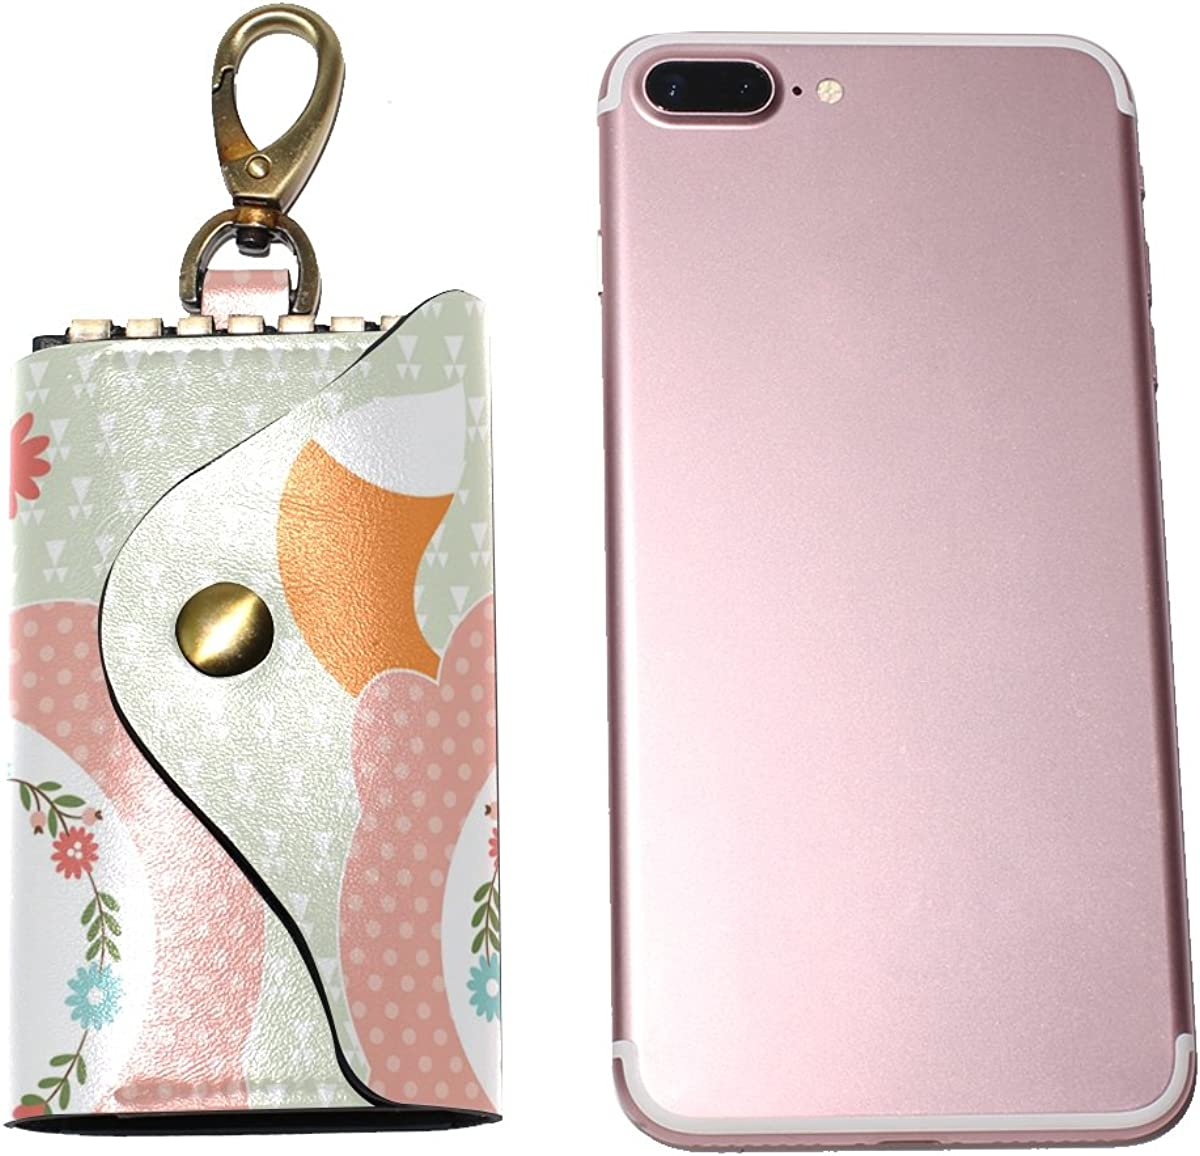 KEAKIA Cute Fox Cartoon Leather Key Case Wallets Tri-fold Key Holder Keychains with 6 Hooks 2 Slot Snap Closure for Men Women